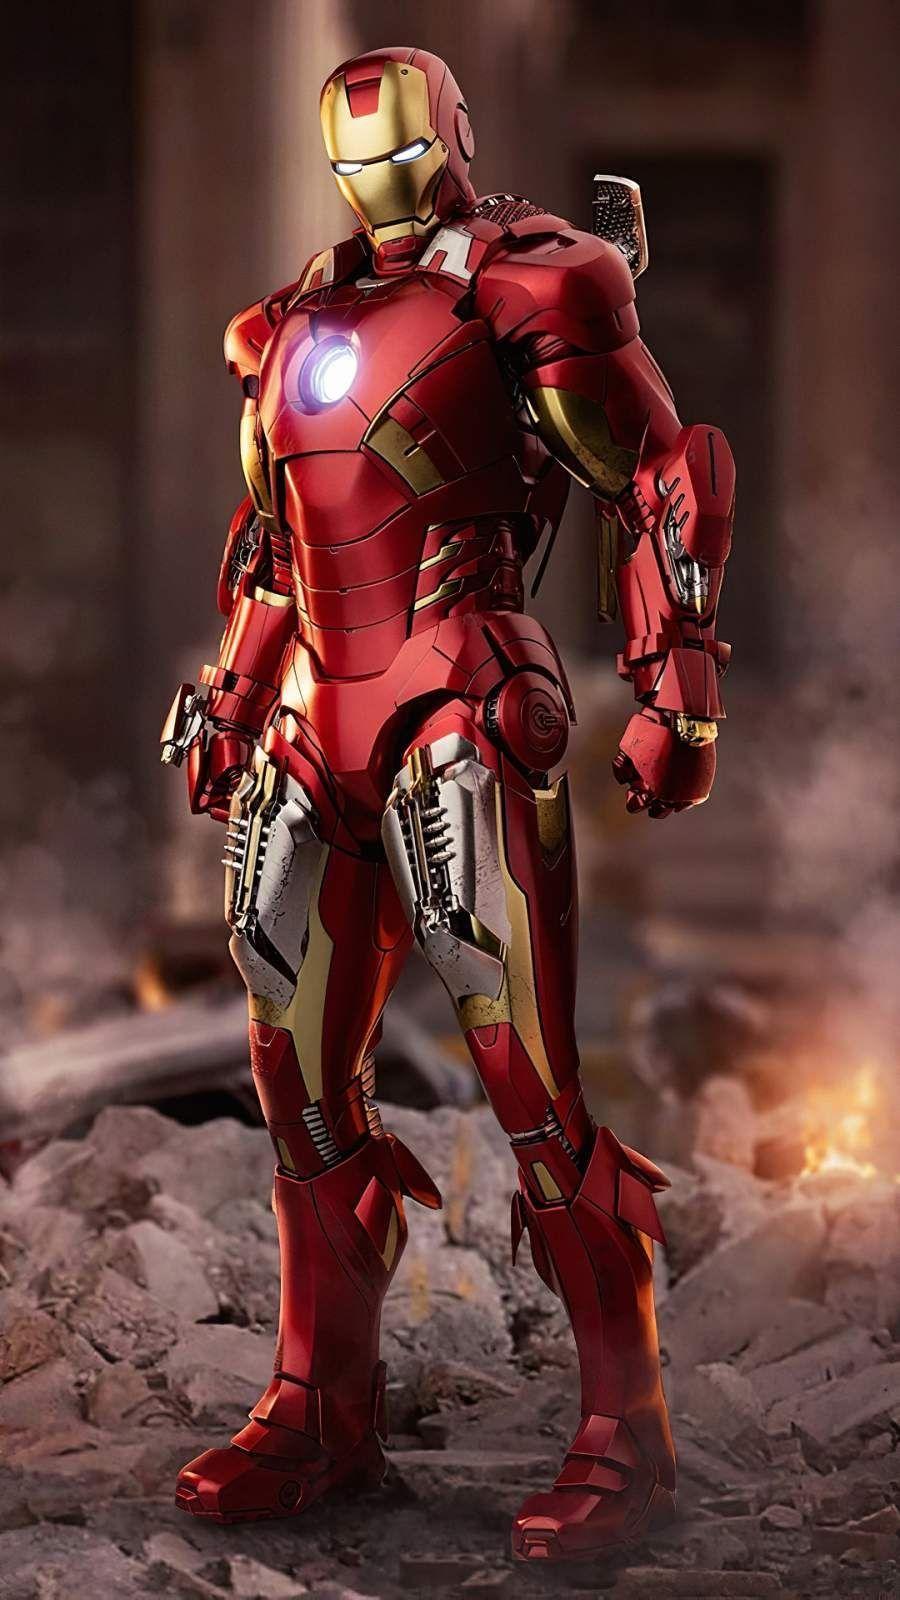 Iron Man Armor 4k Iphone Wallpaper Iphone Wallpaper Iron